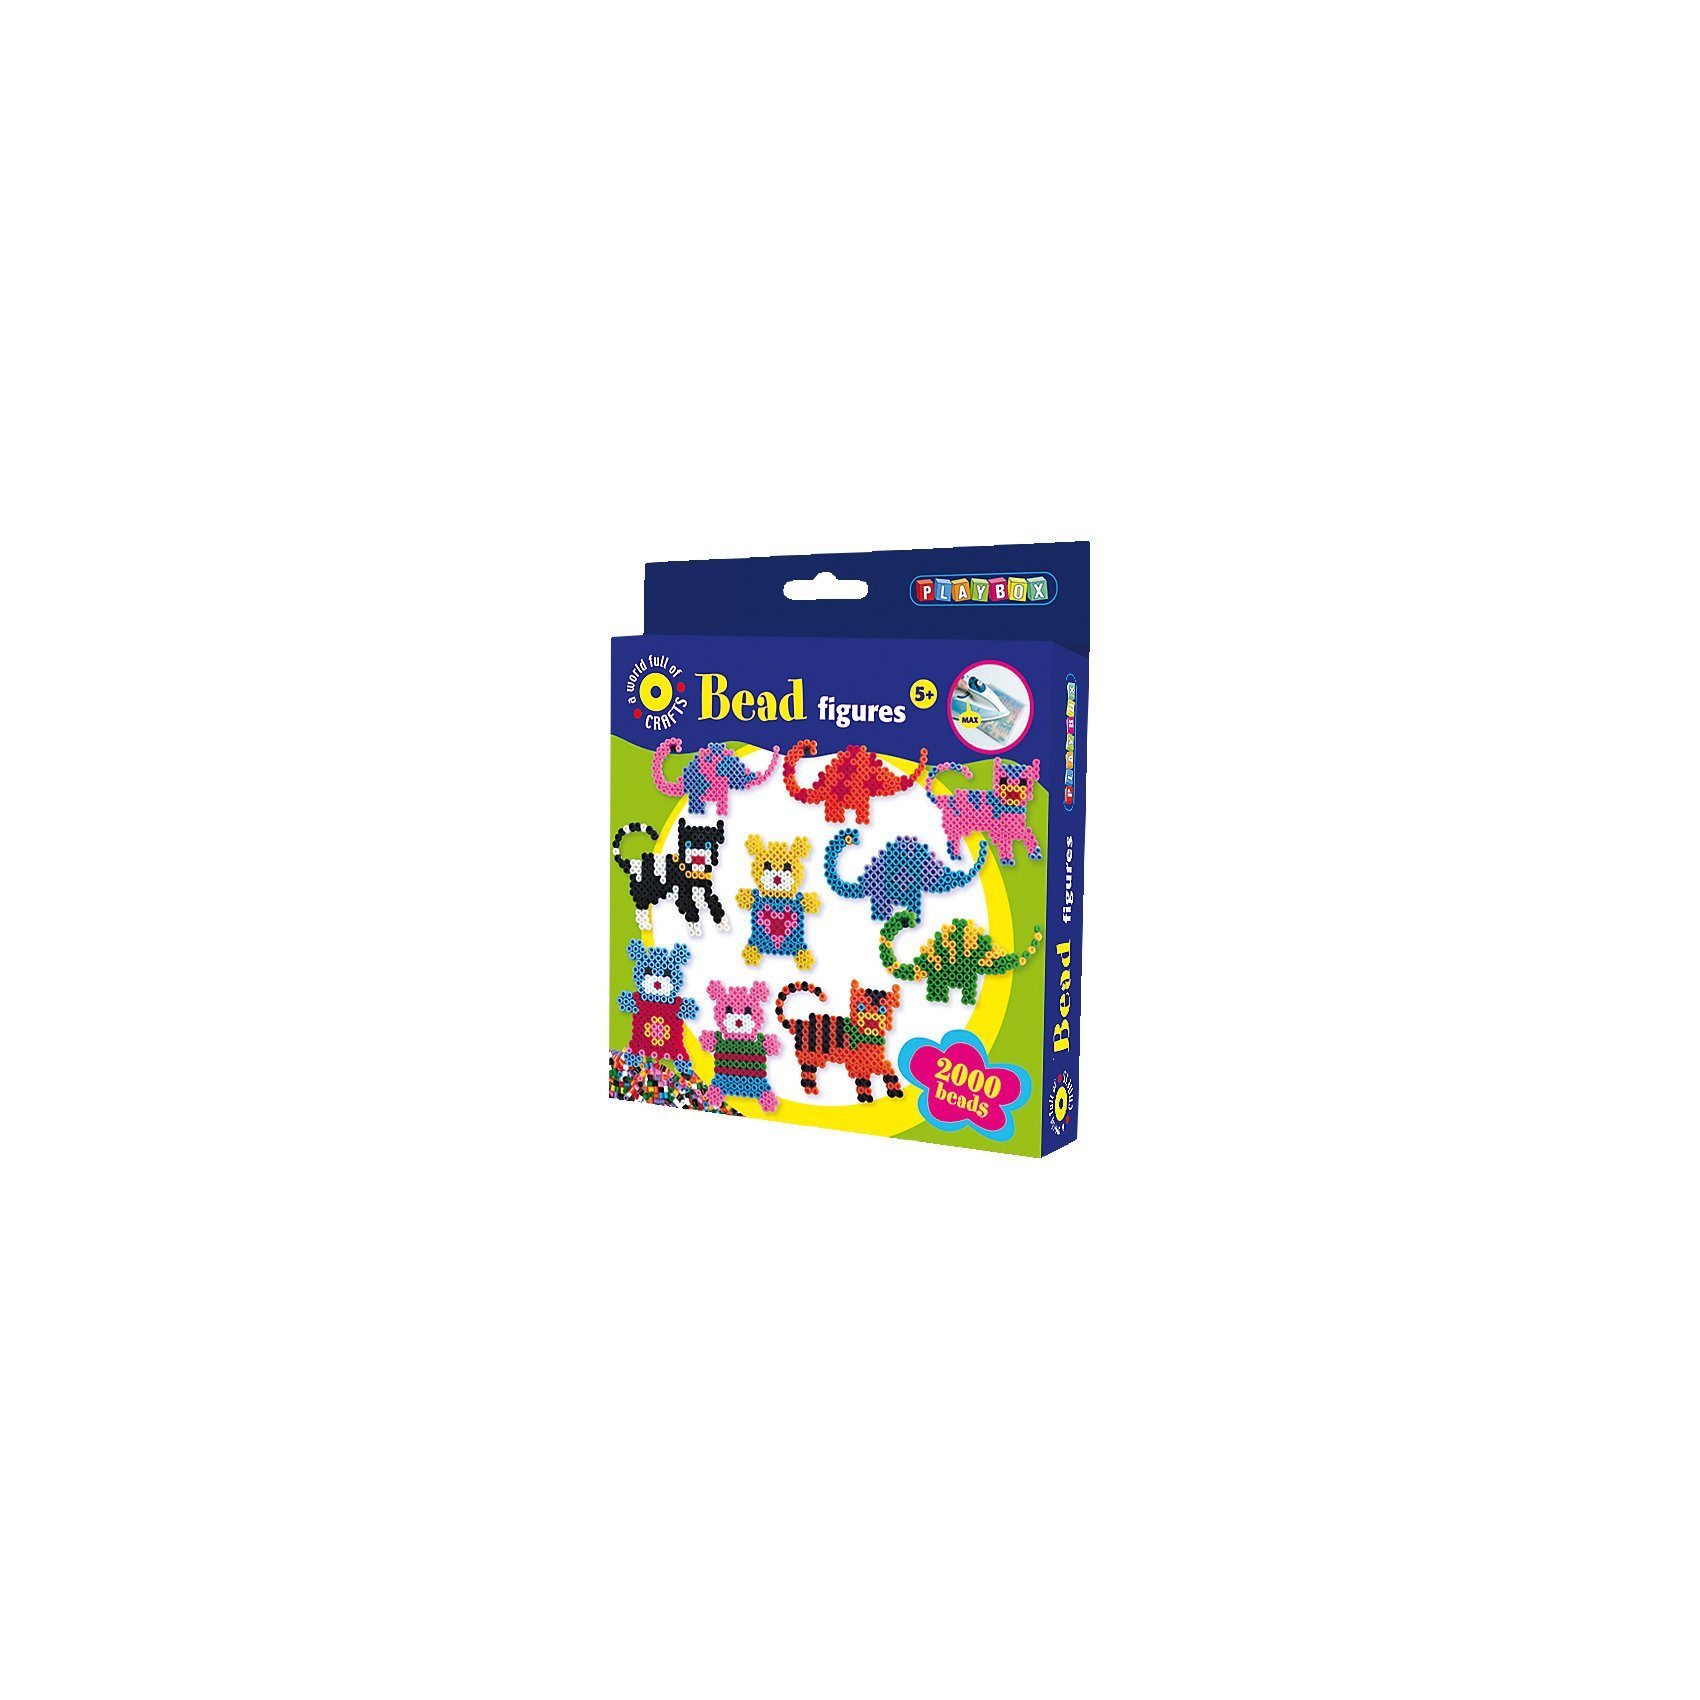 Playbox Bügelperlenset Katze, Dinosaurier & Bär - 2000 Perlen & Zube